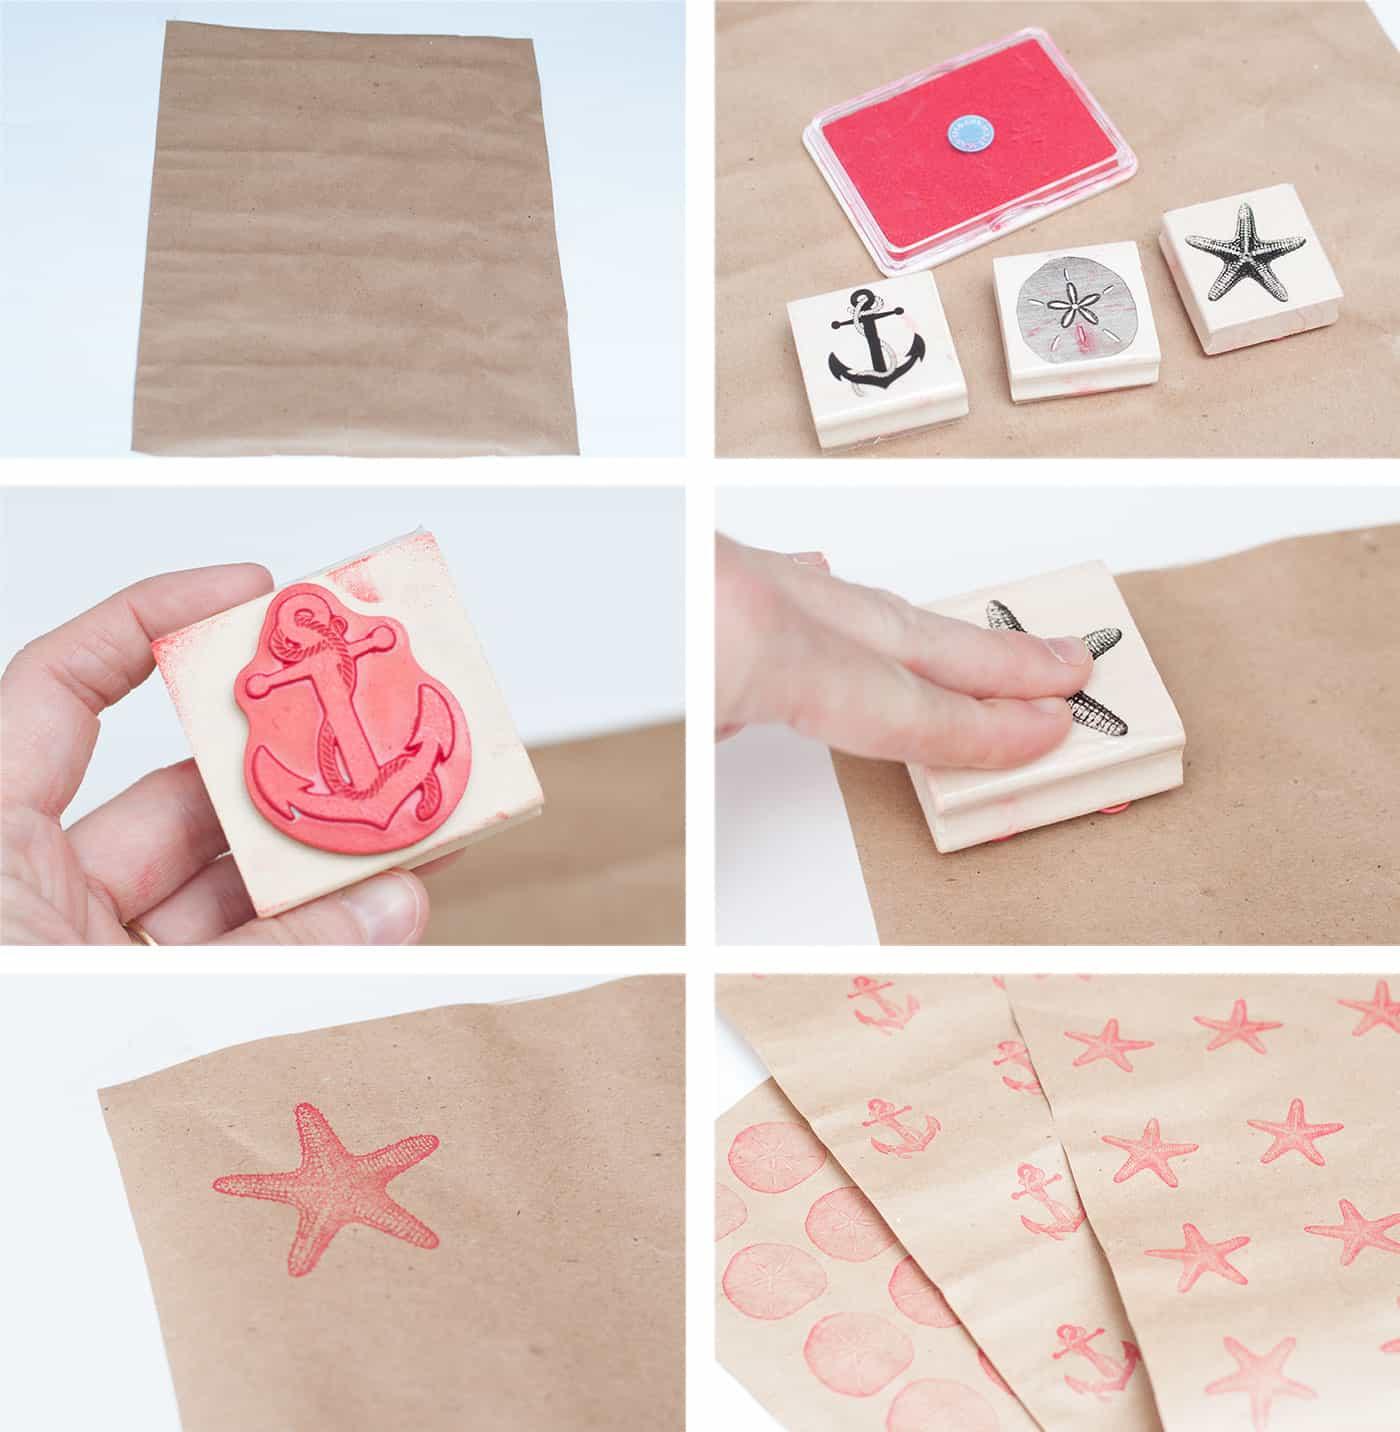 Stamping on Christmas gift wrap